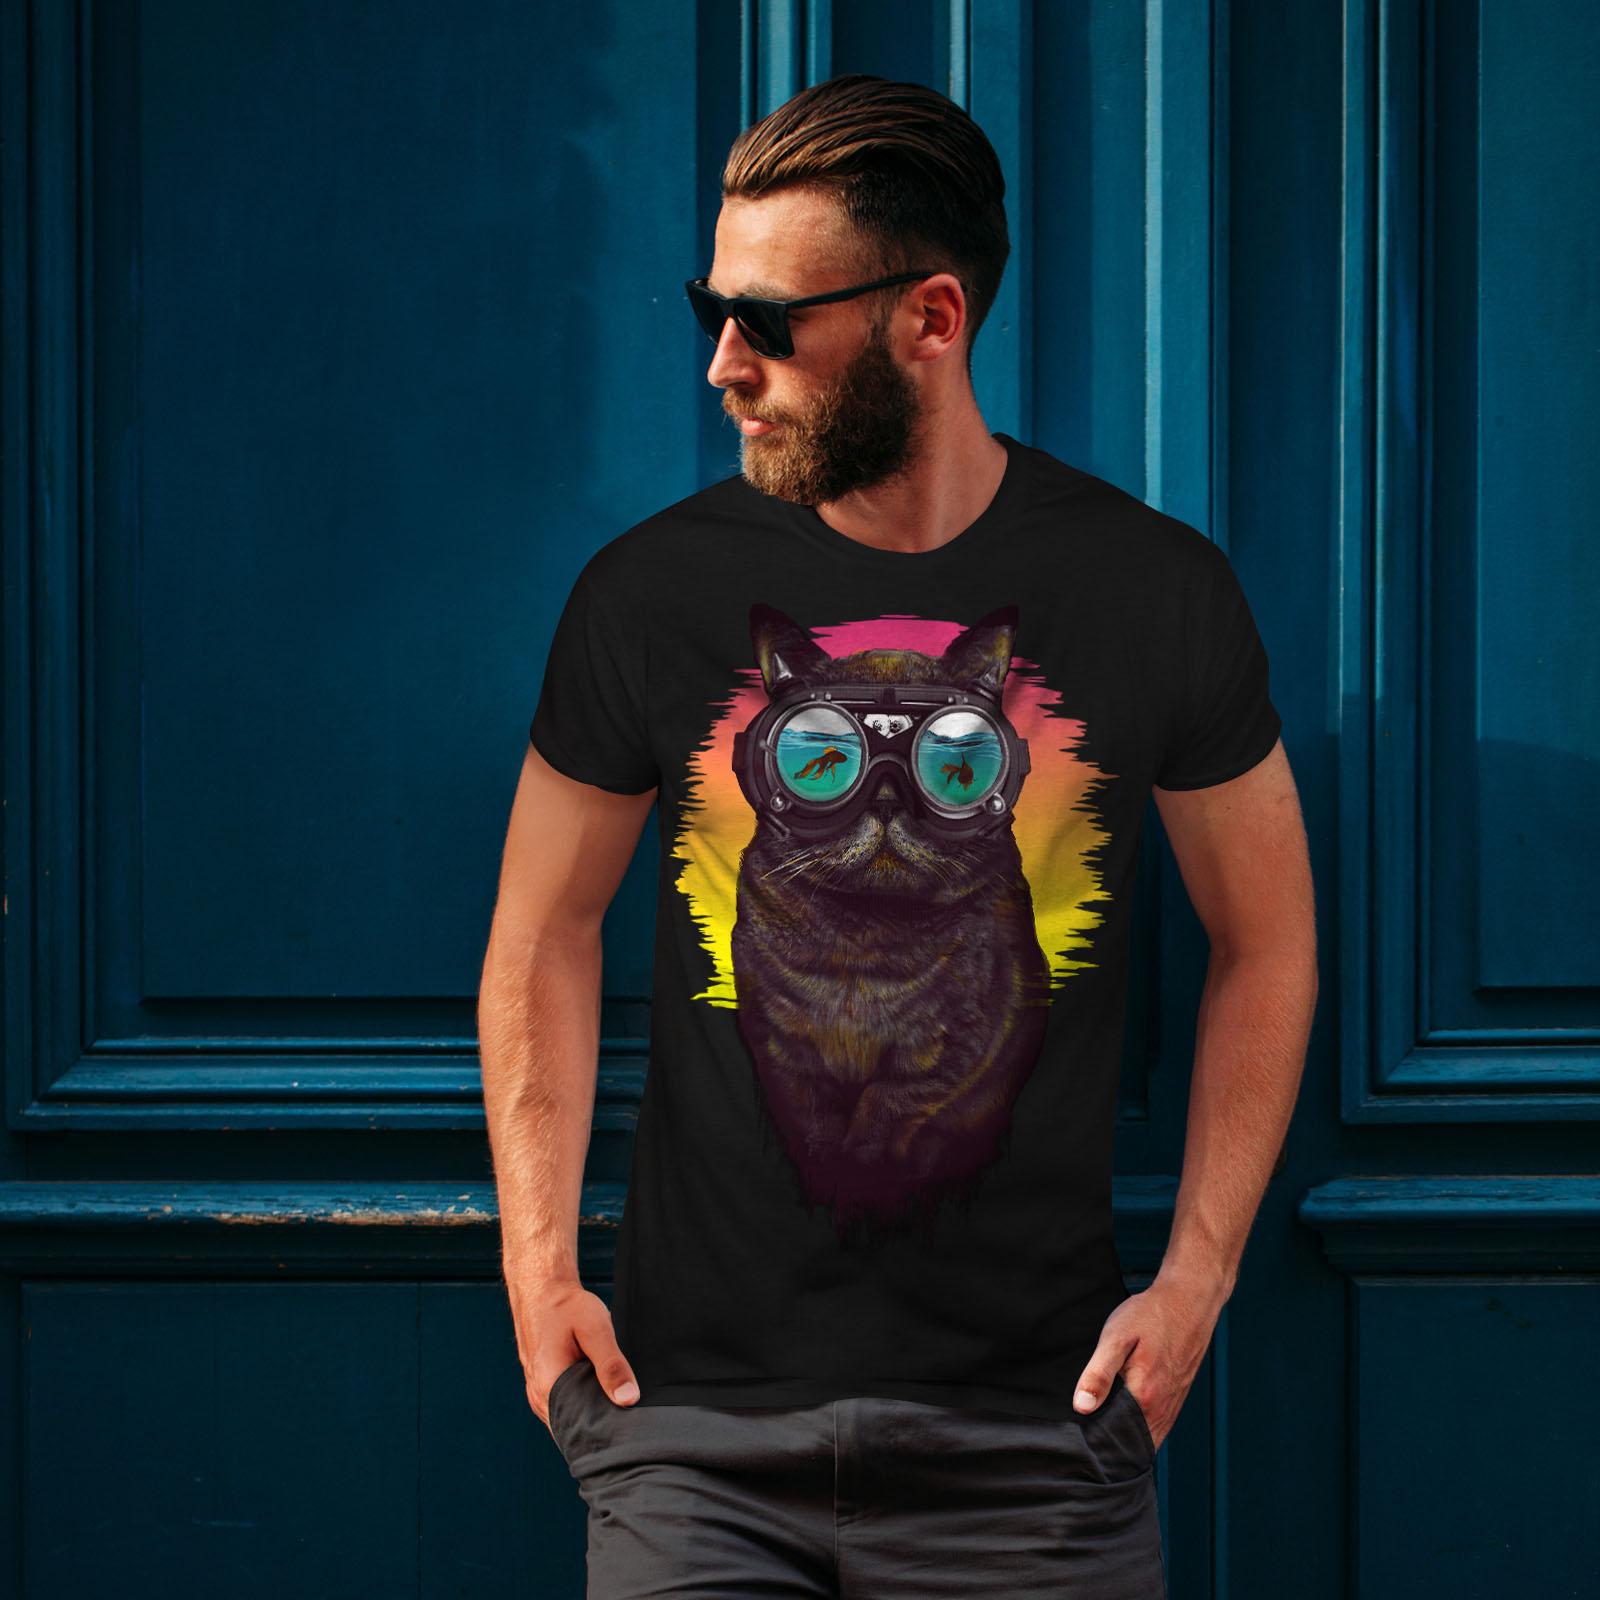 Wellcoda-Hippie-Glasses-Cool-Cat-Mens-T-shirt-Fish-Graphic-Design-Printed-Tee thumbnail 4